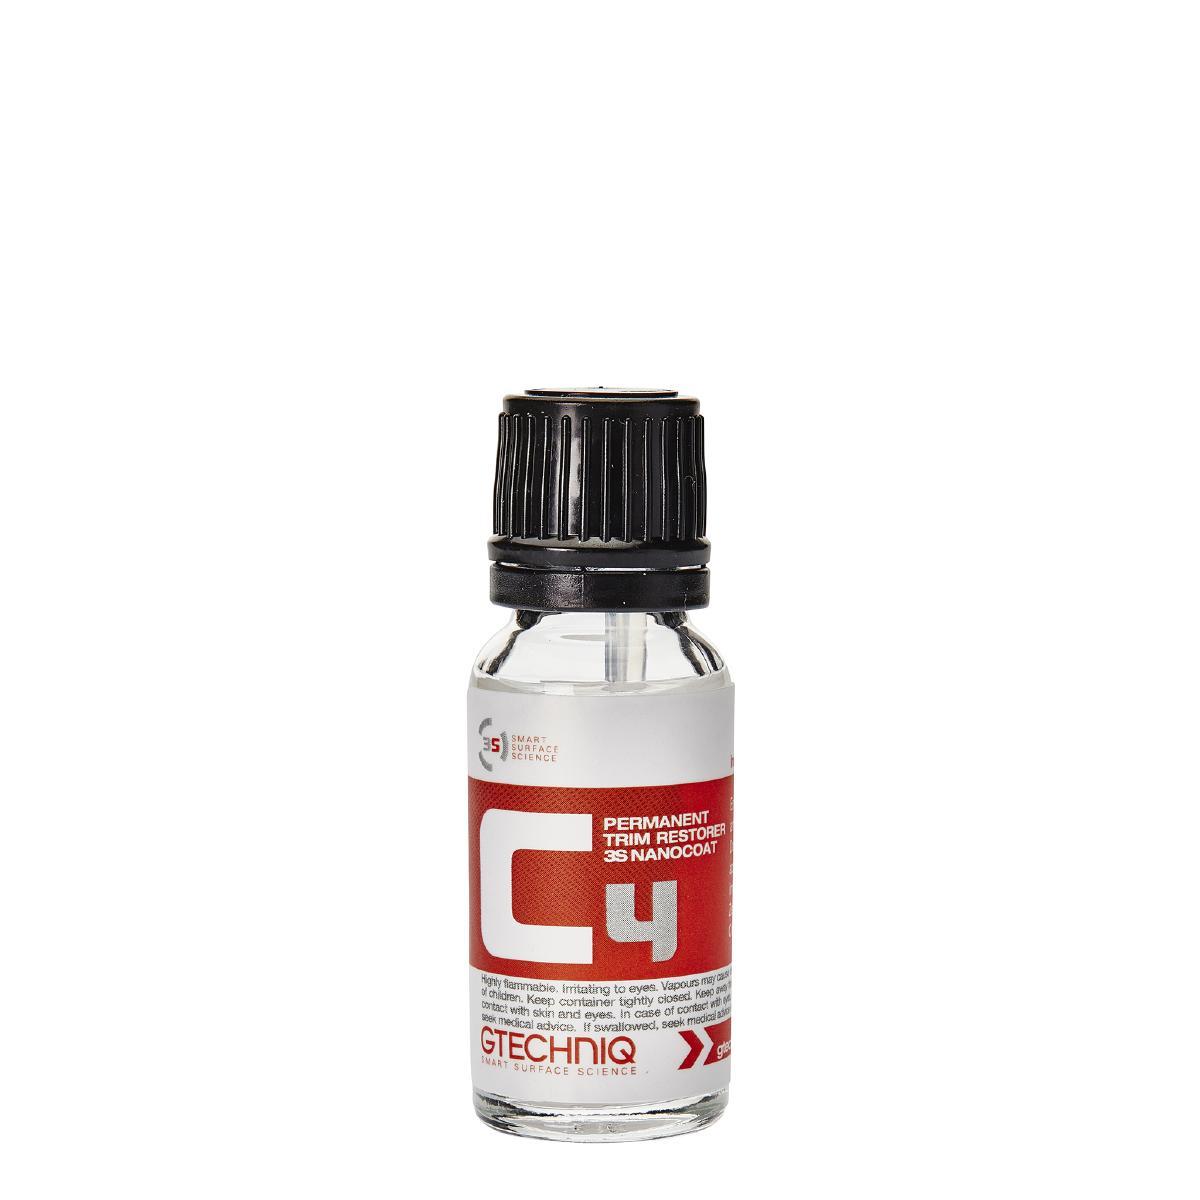 Plastförsegling Gtechniq C4 Permanent Trim Restorer, 15 ml